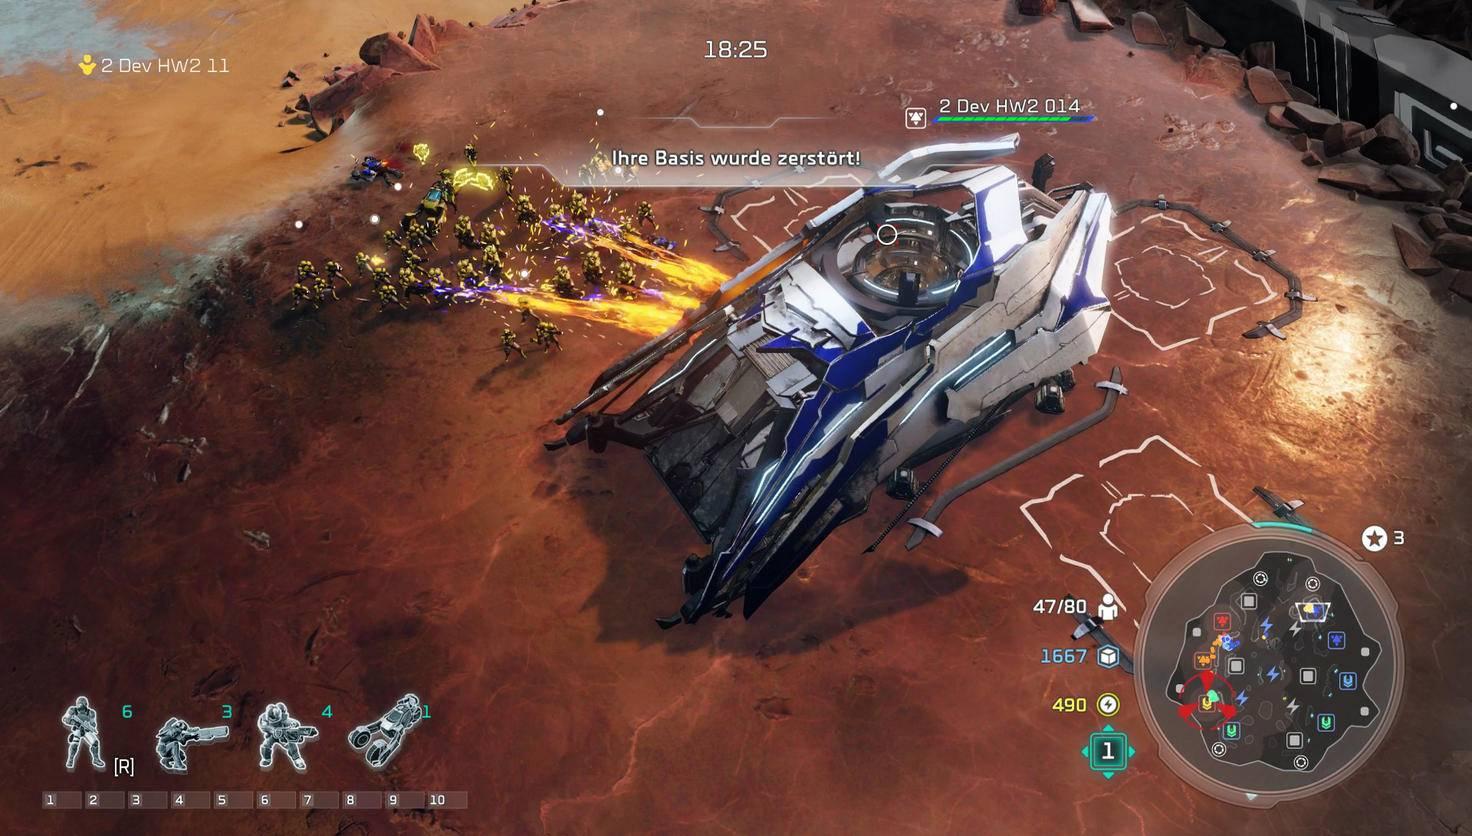 Halo Wars 2 Multiplayer